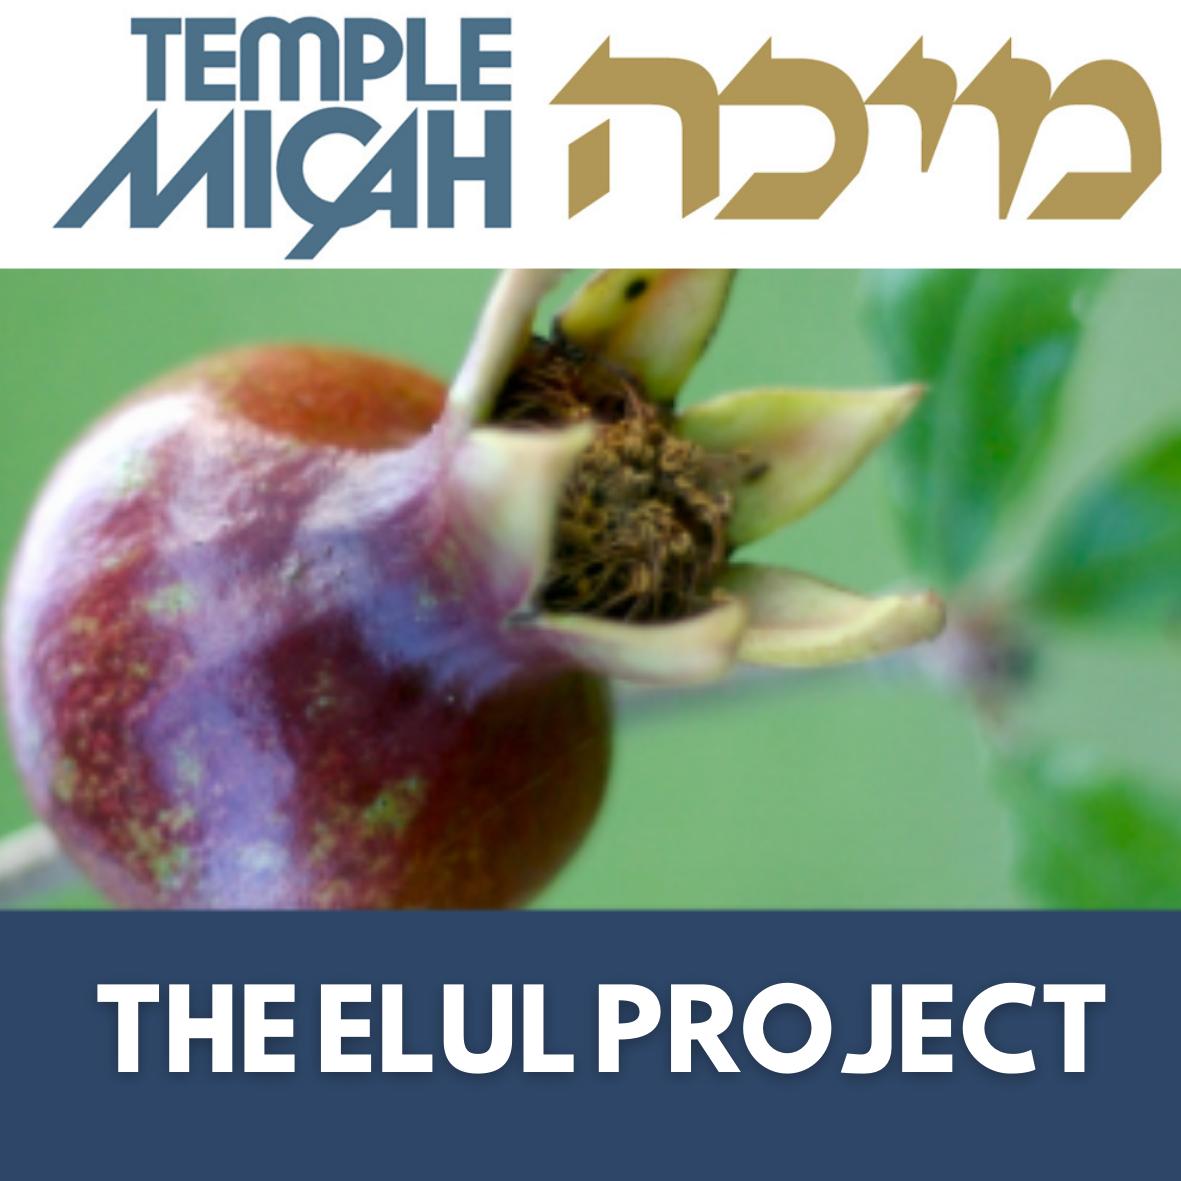 The Elul Project